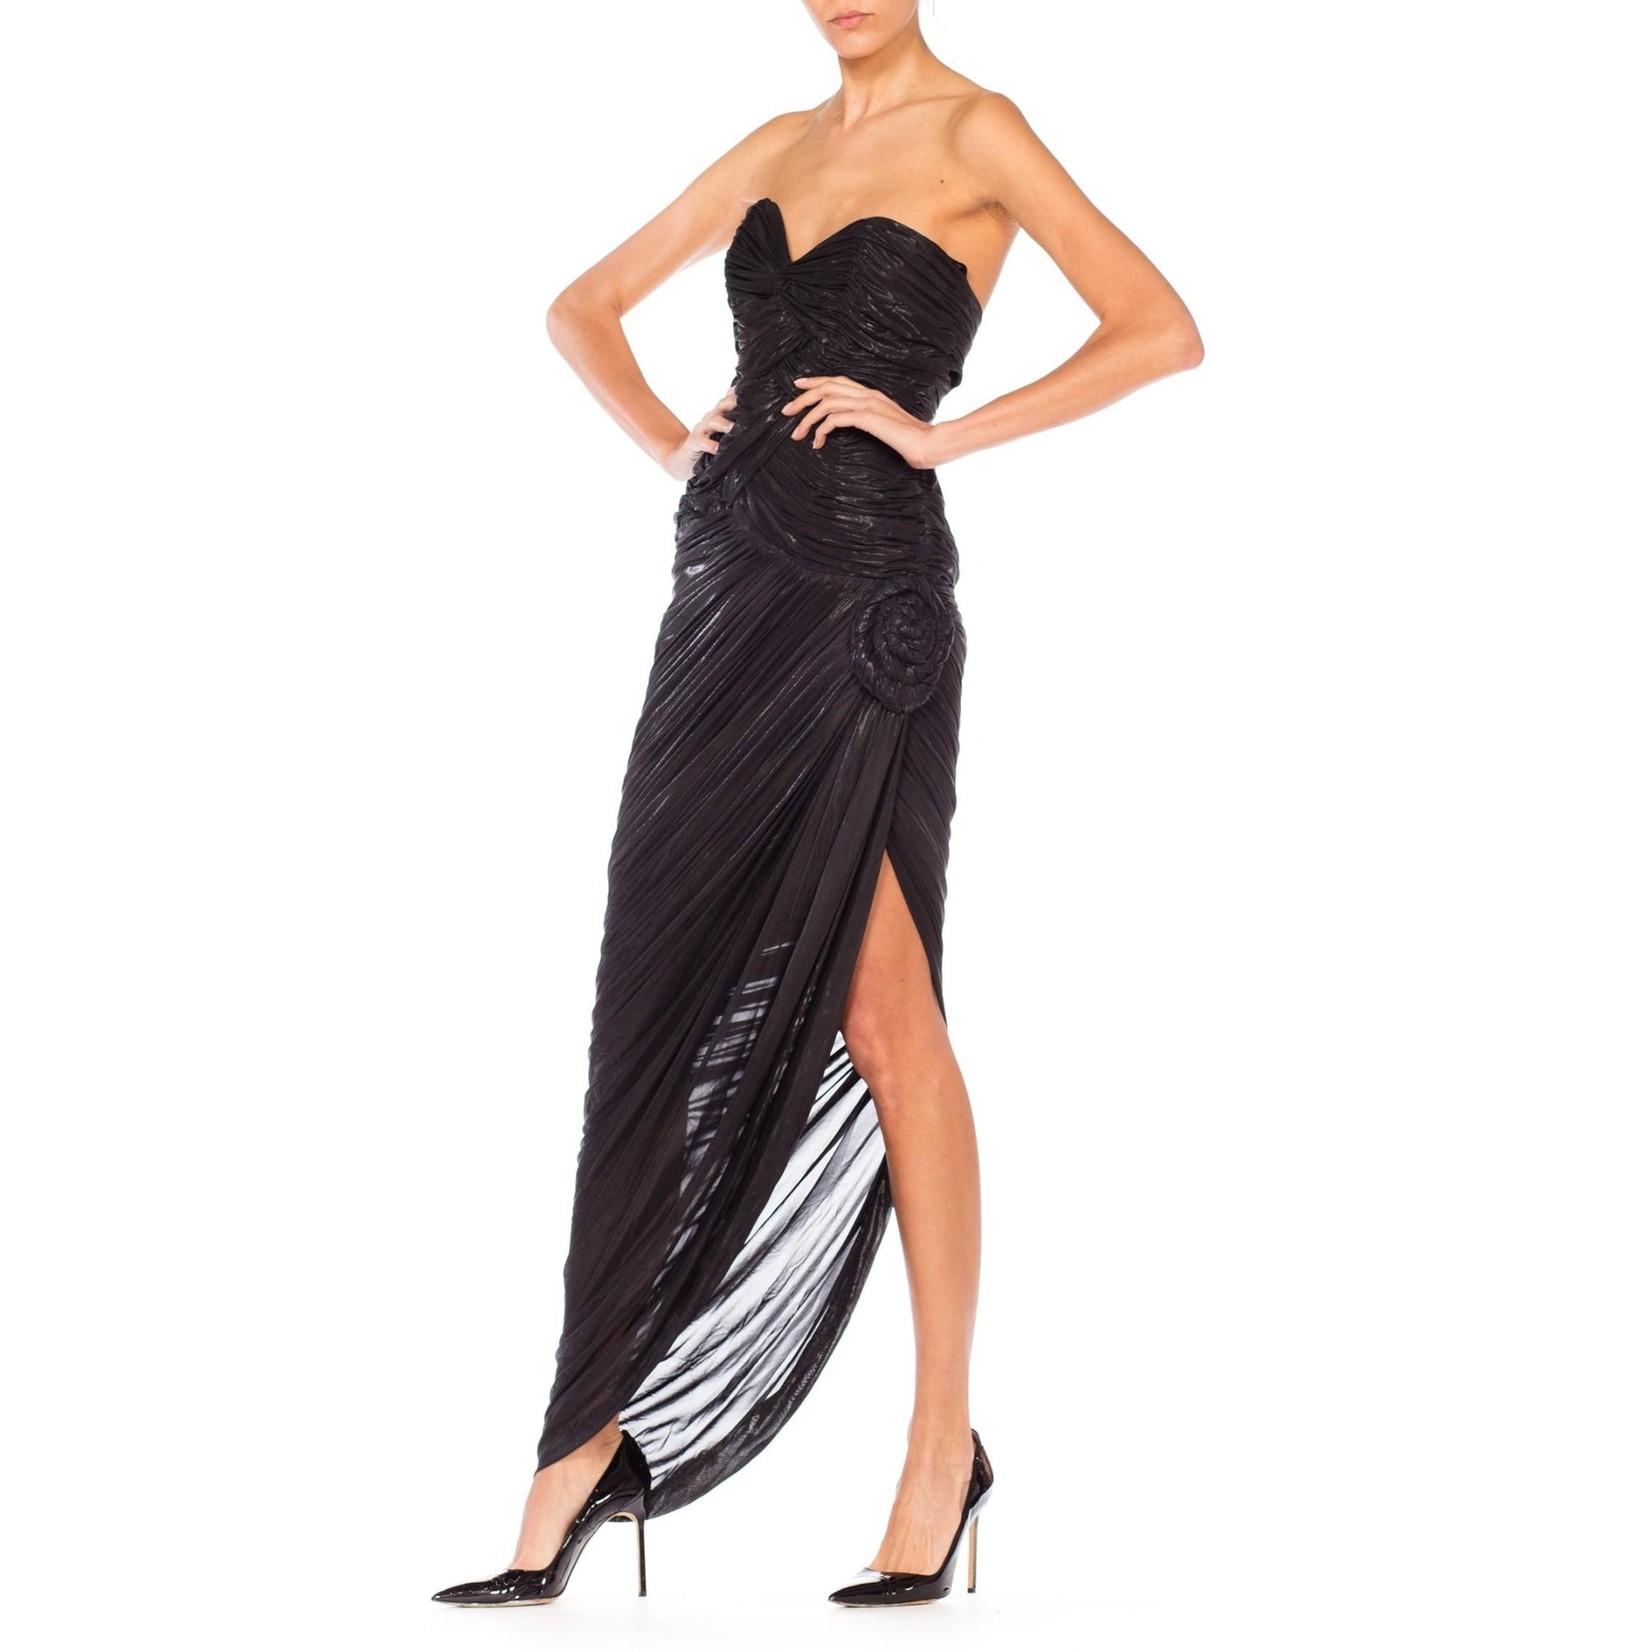 Morphew 1980s Claude Petin Paris Black Metallic Rayon Blend Chiffon Jersey Strapless High Slit Gown with Back Cut Outs